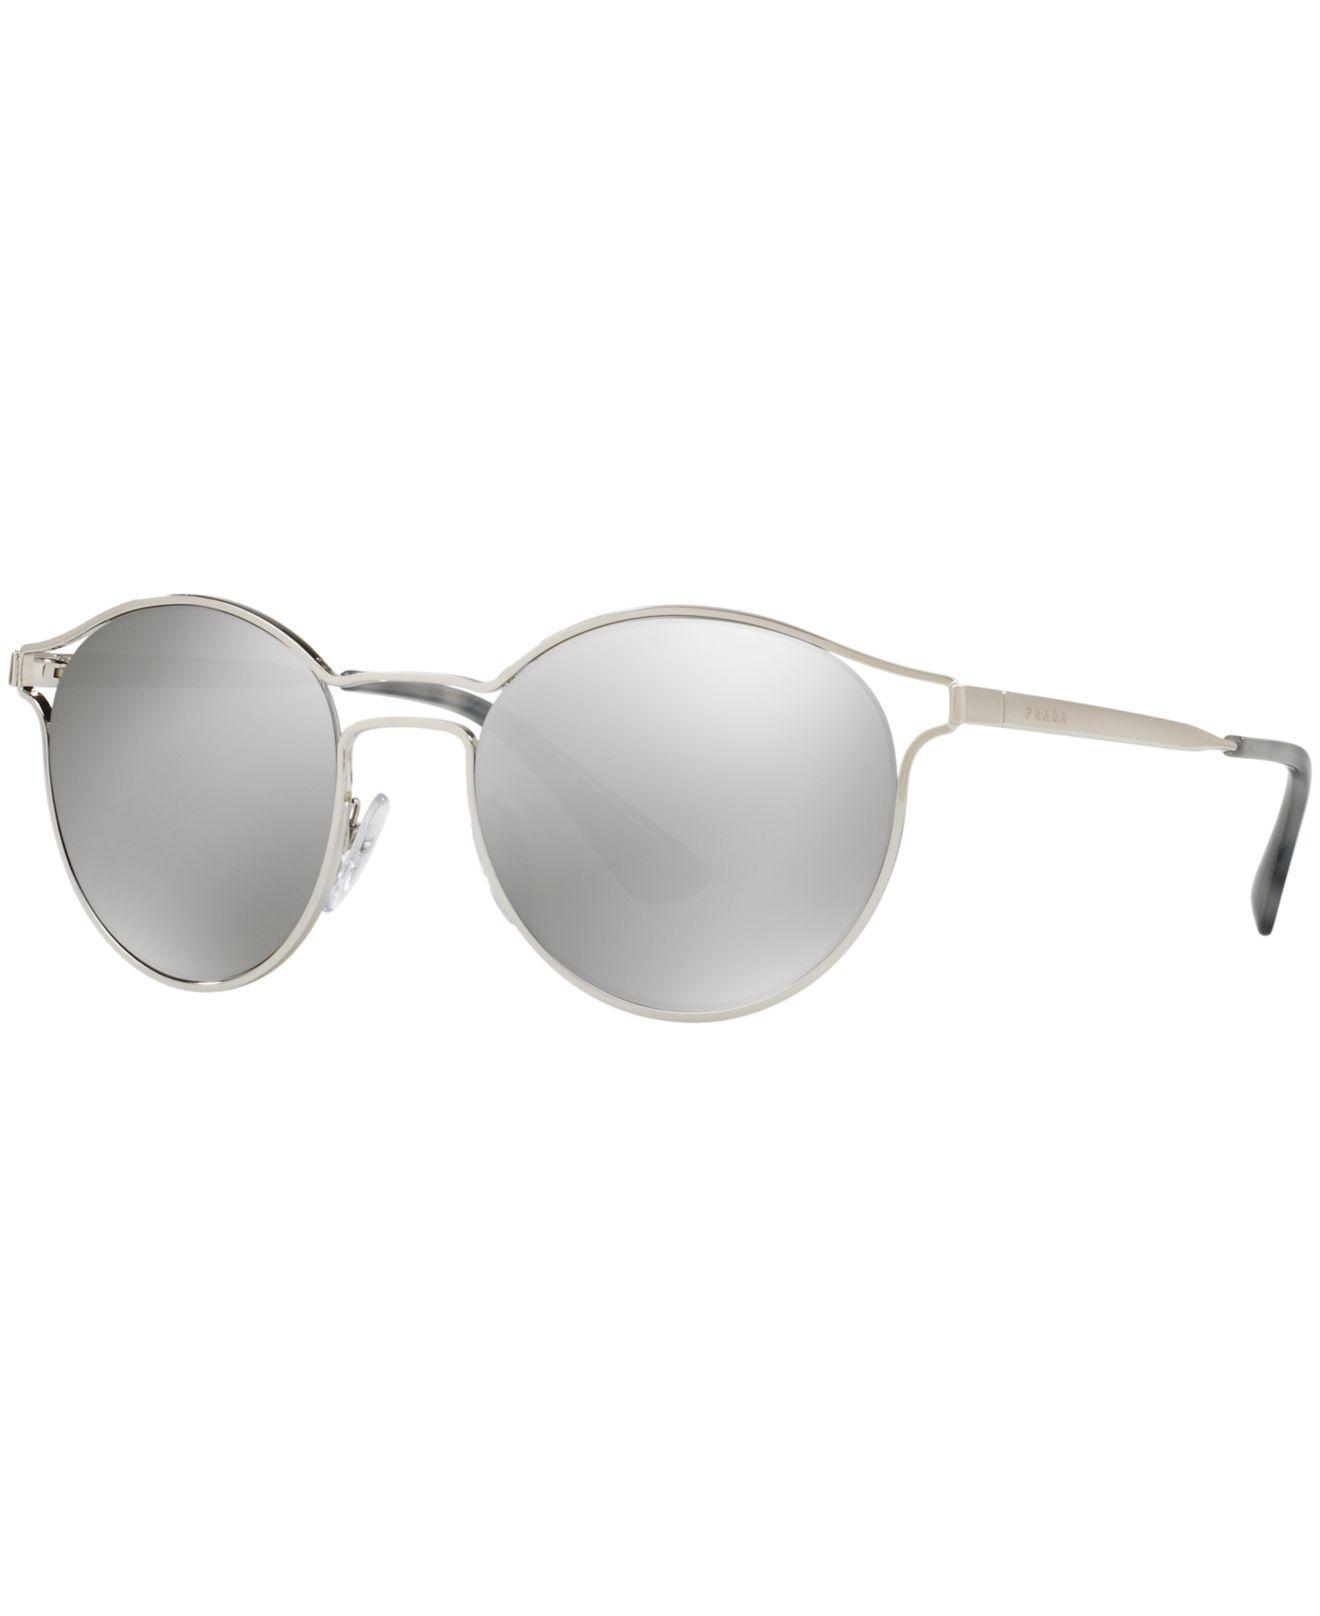 e47d698c88c Prada. Women s Metallic Sunglasses